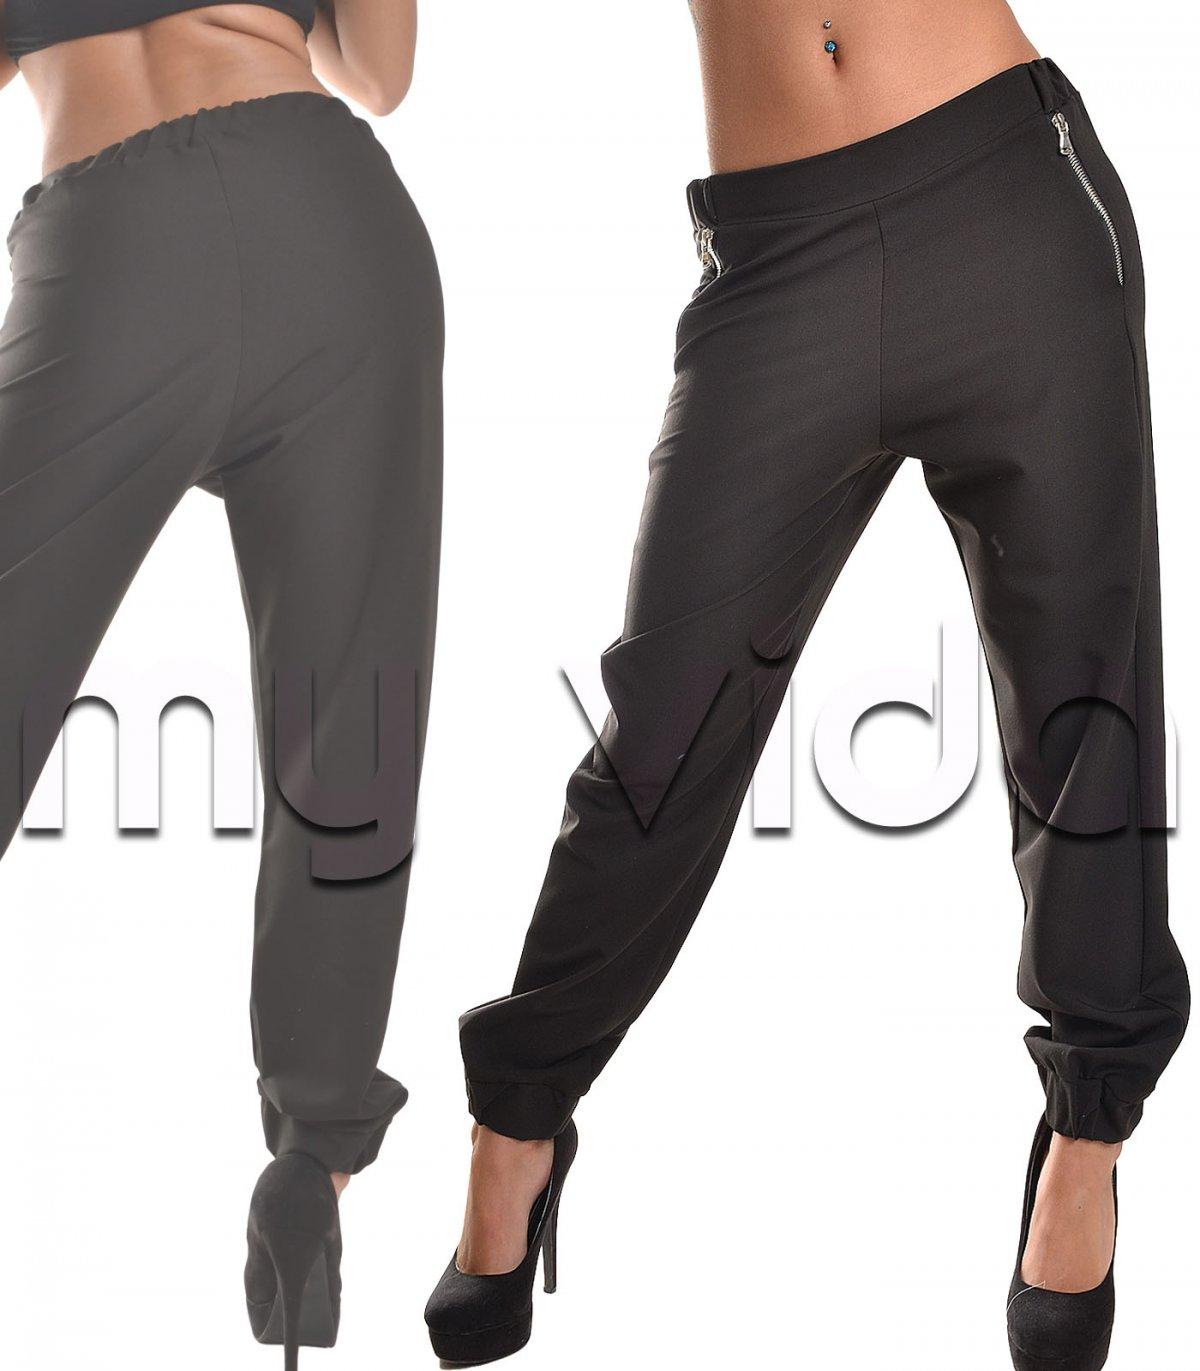 Pantaloni Con Donna Pantaloni Donna Con Elastici Elastici Pantaloni qVpMzSUG